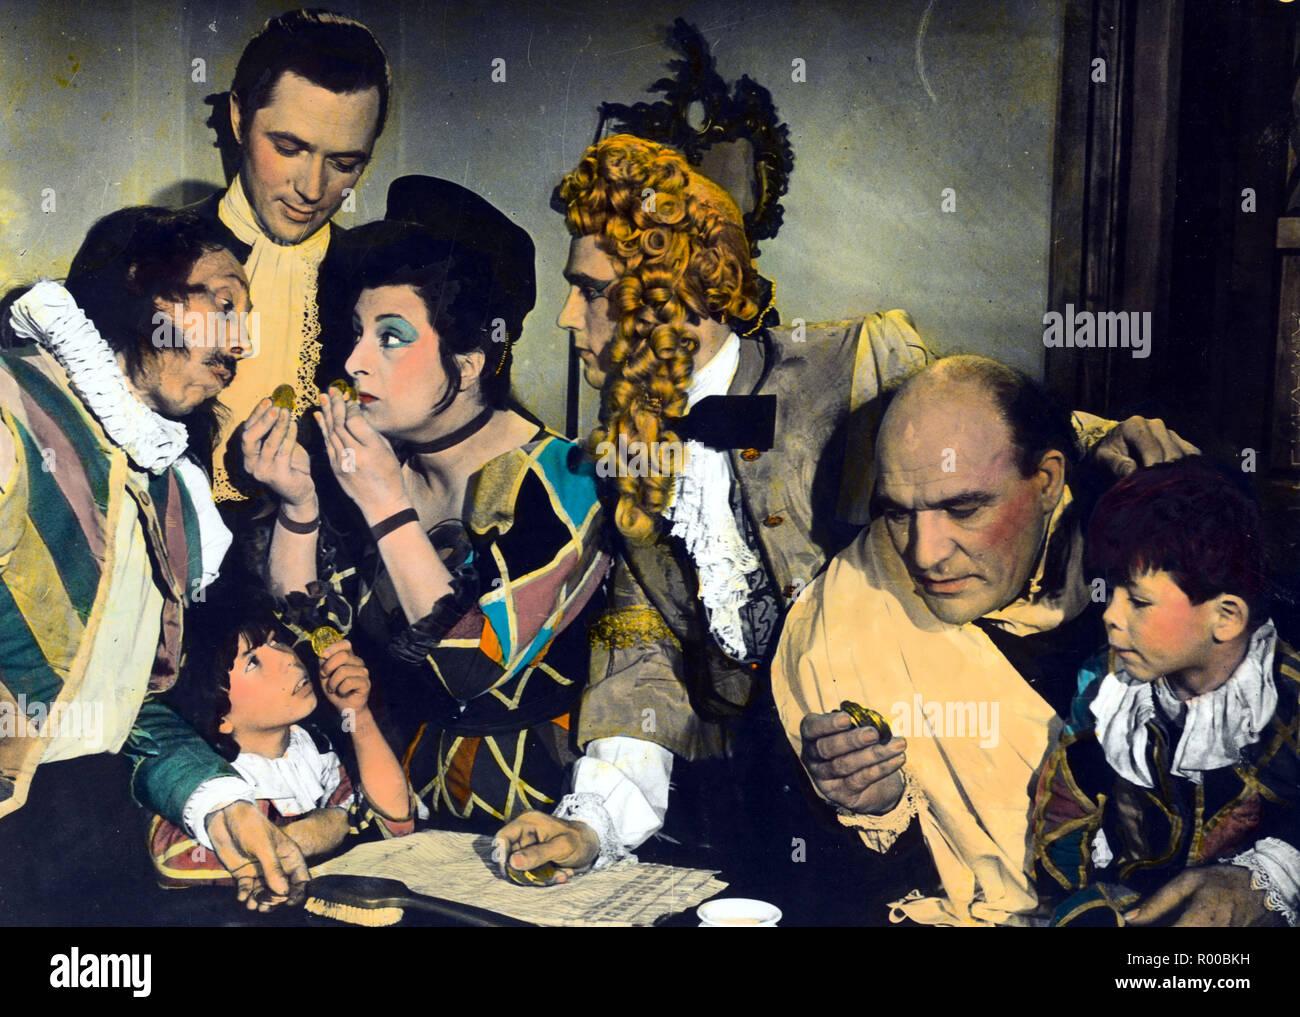 Anna Biella Movie italy peru stock photos & italy peru stock images - alamy